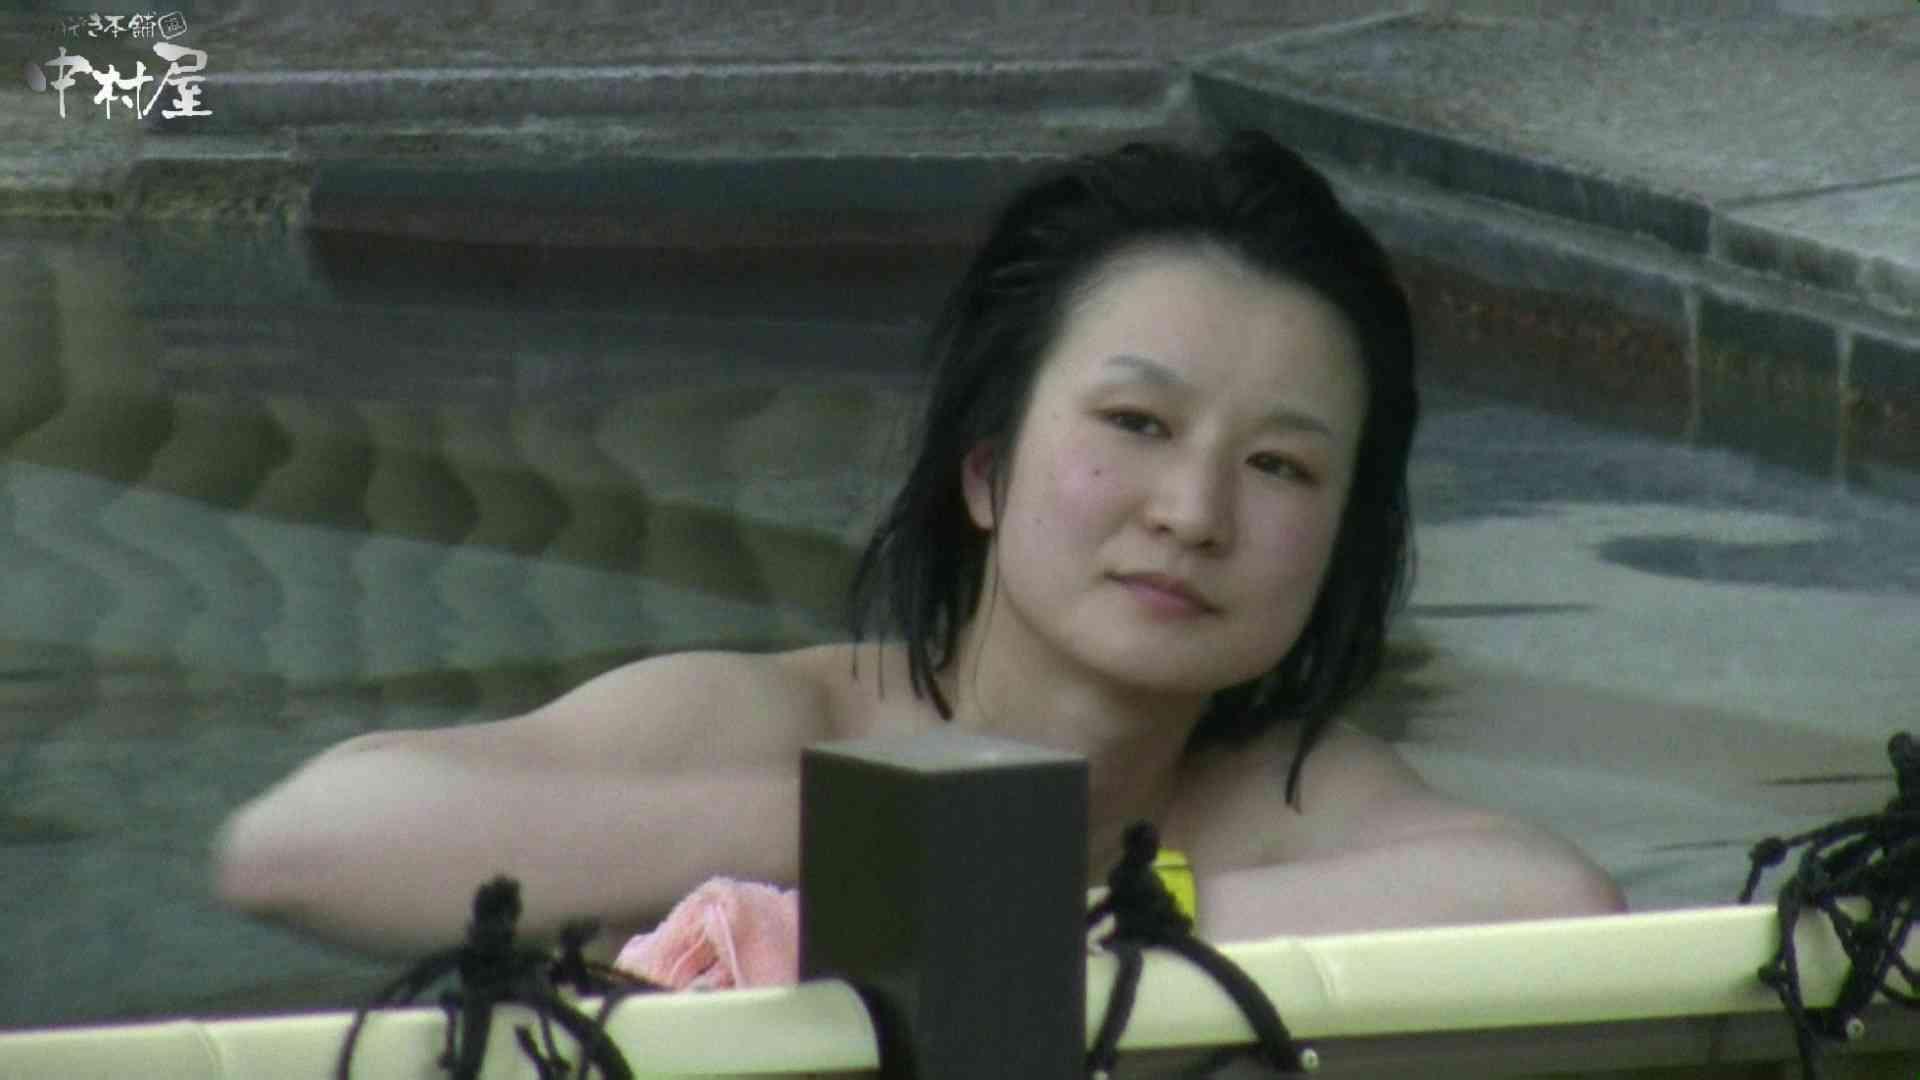 Aquaな露天風呂Vol.982 盗撮特撮 | OLのプライベート  13pic 10